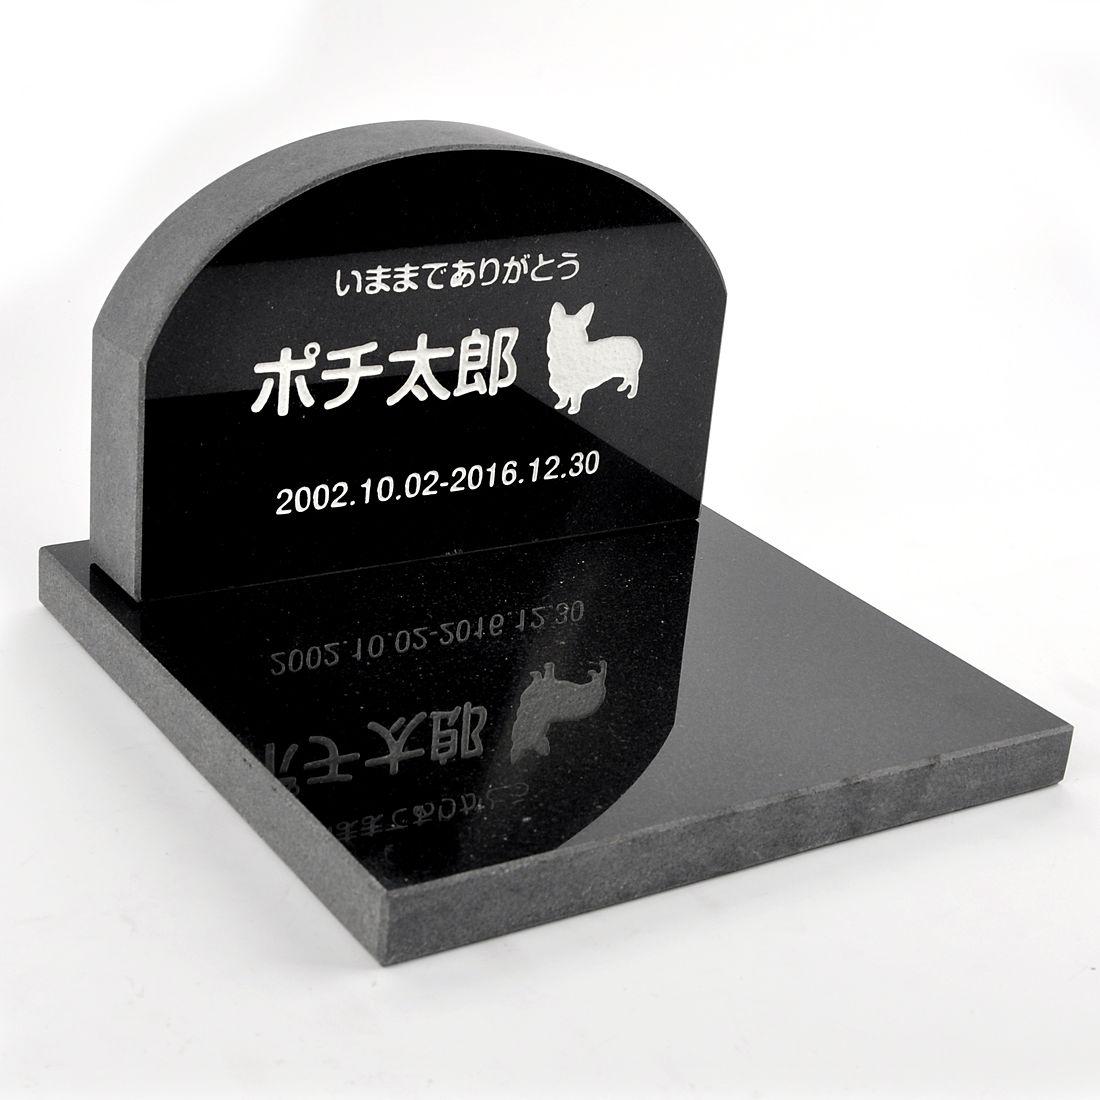 Pet&Love. ペットのお墓 天然石製 セット型 御影石 ブラック アーチ  【HLS_DU】【楽ギフ_名入れ】 attr131attr ctgr2ctgr sml3sml+ctgr2ctgr DOG